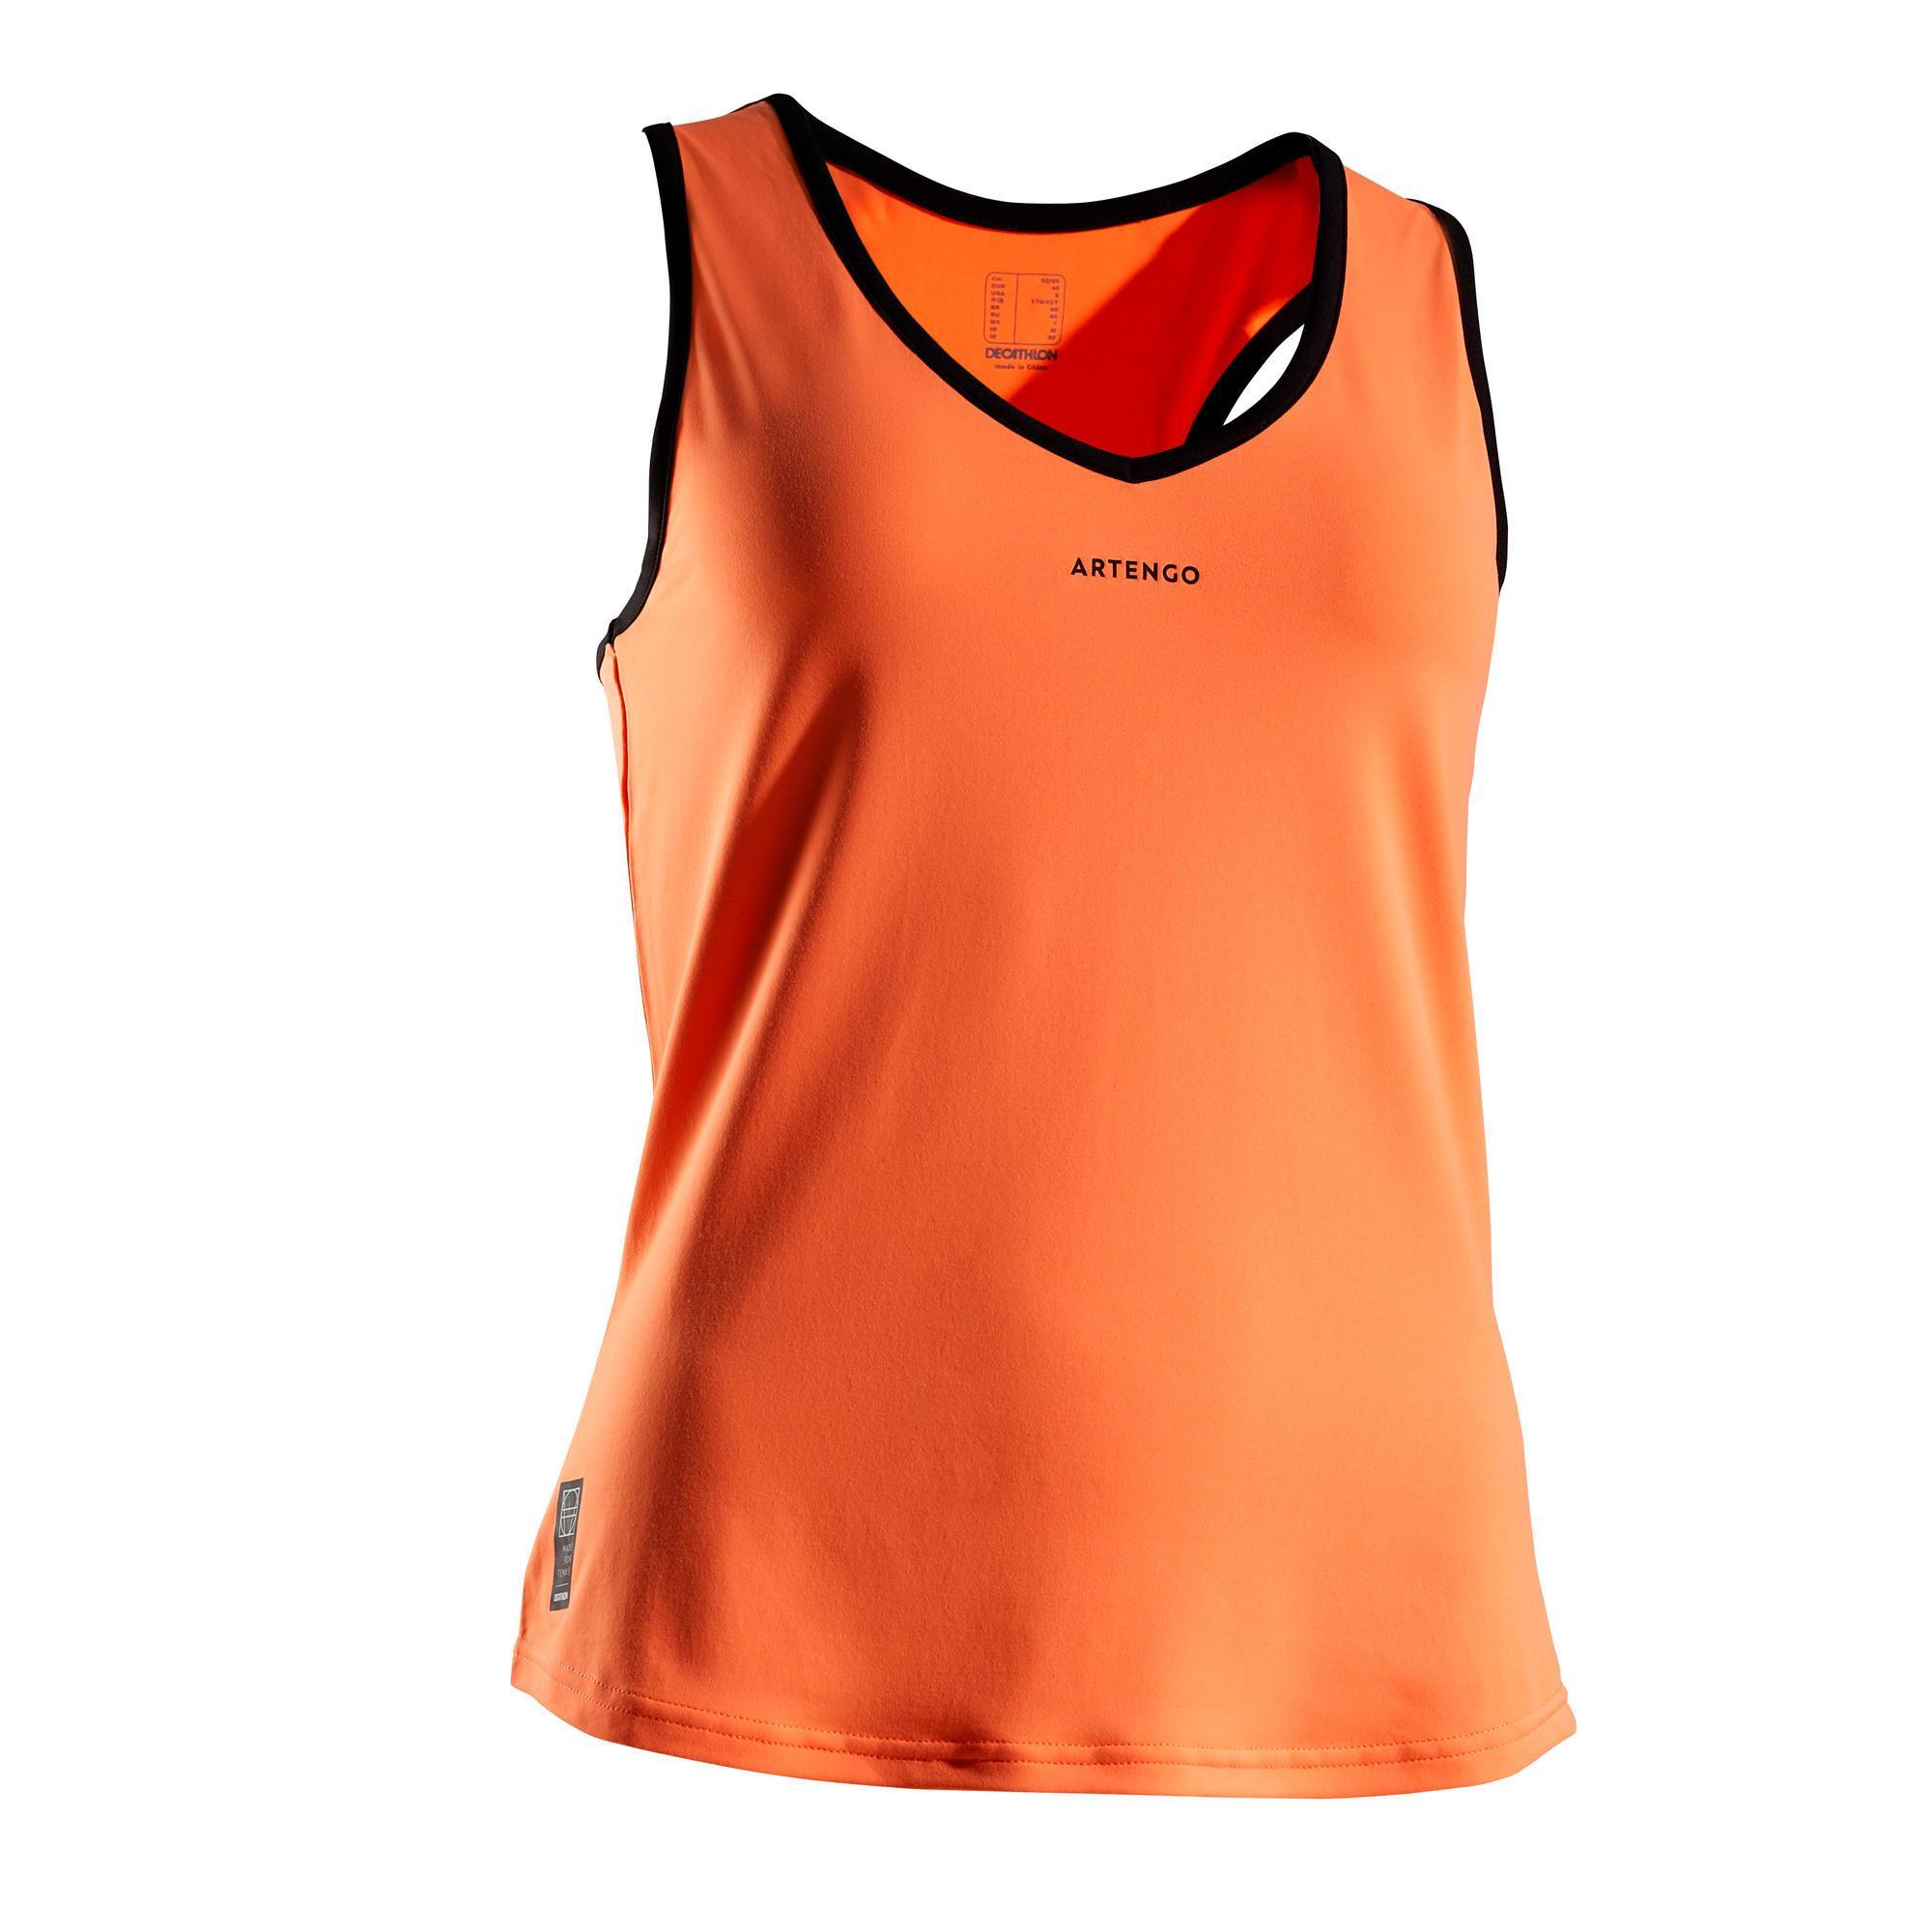 Tennis-Top TK Light 900 Damen orange | Sportbekleidung > Sporttops > Tennistops | Orange - Rosa - Schwarz | Artengo